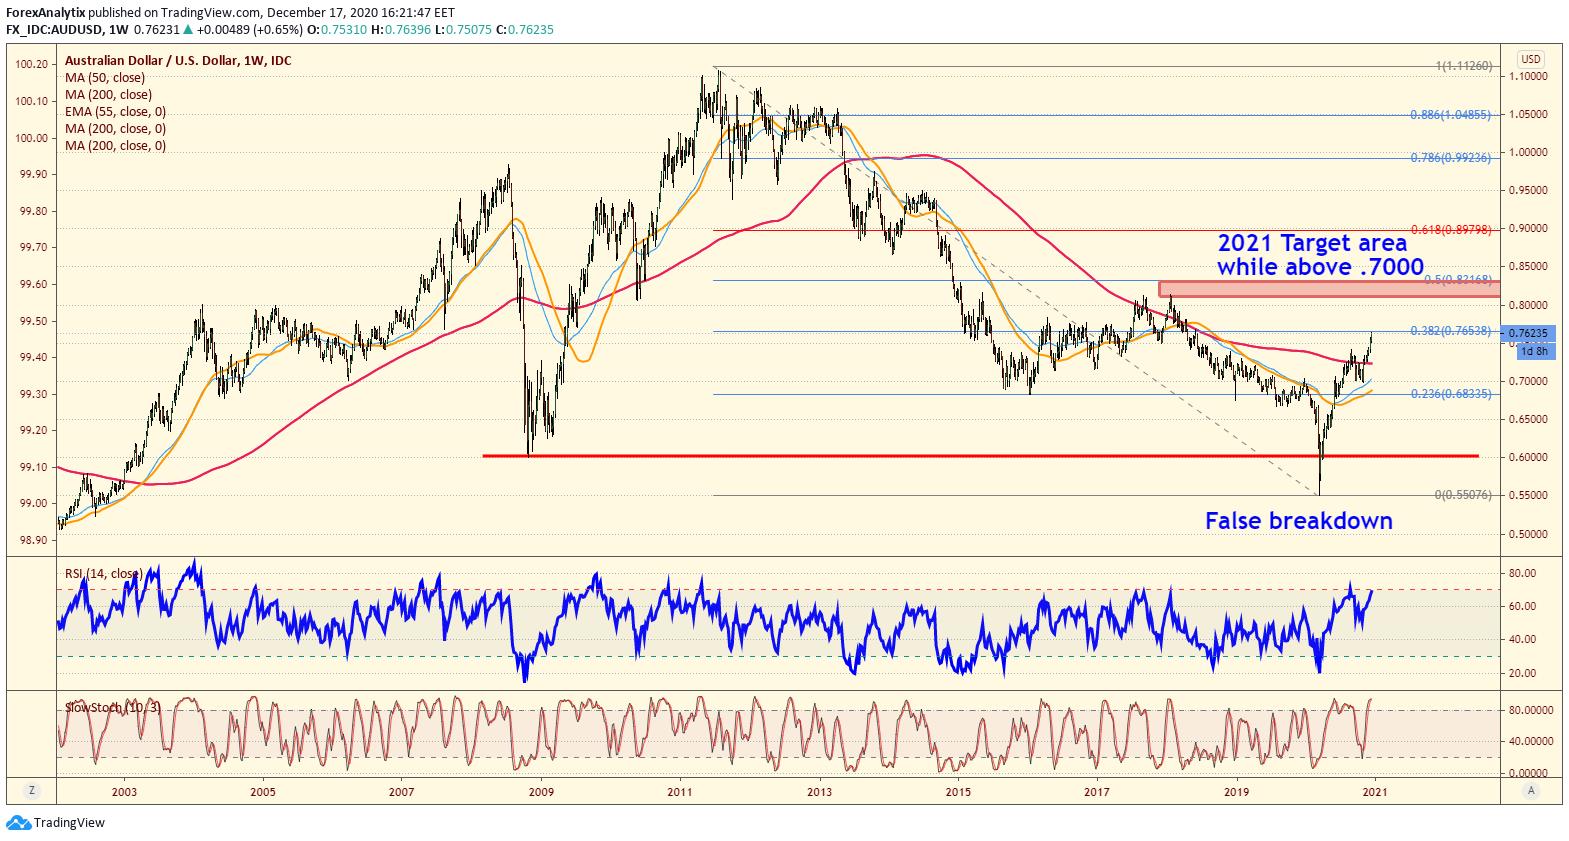 AUDUSD Market Outlook